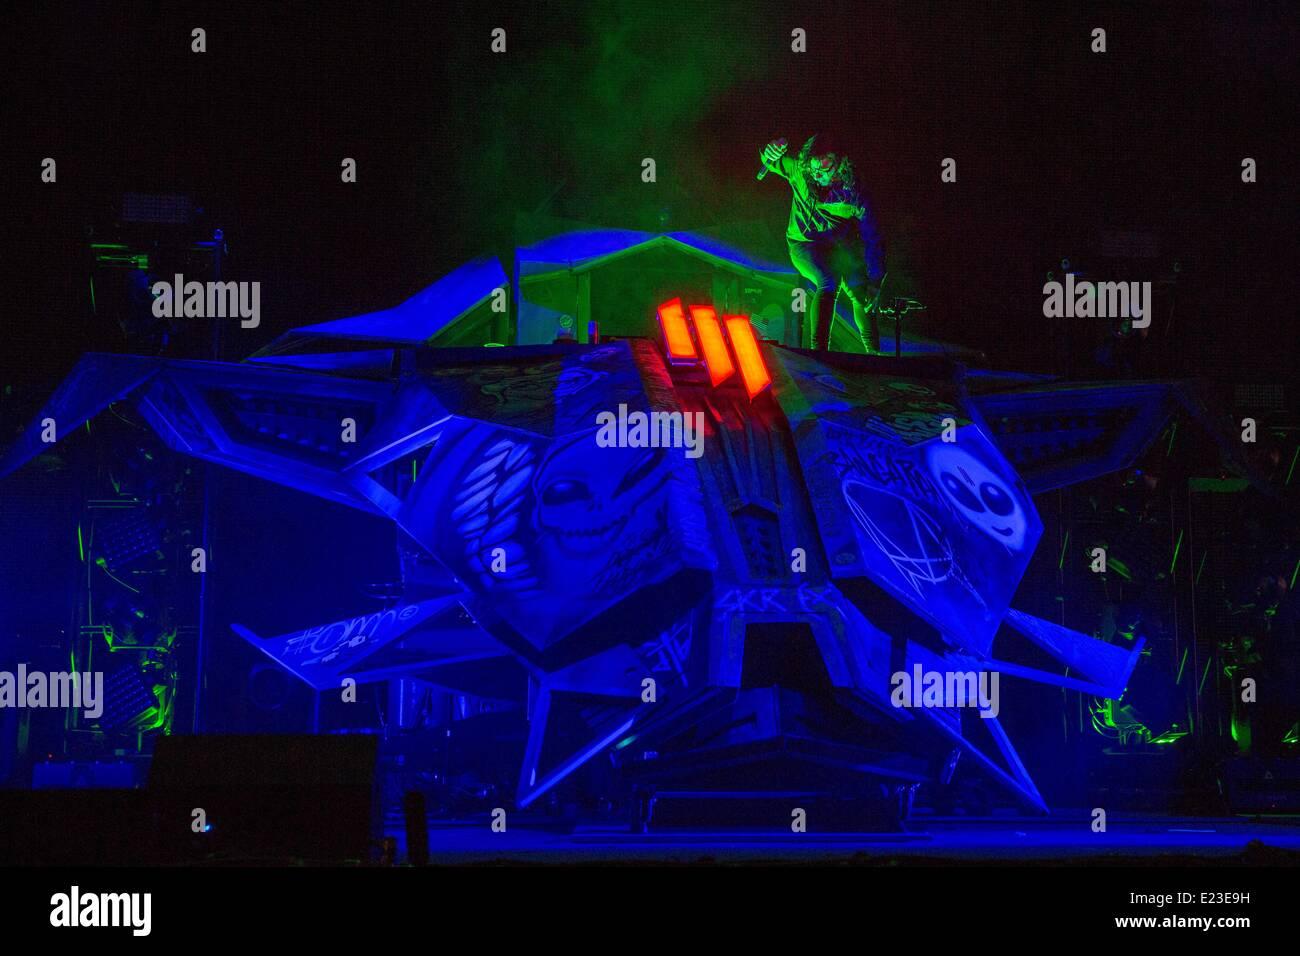 Skrillex Stock Photos & Skrillex Stock Images - Alamy